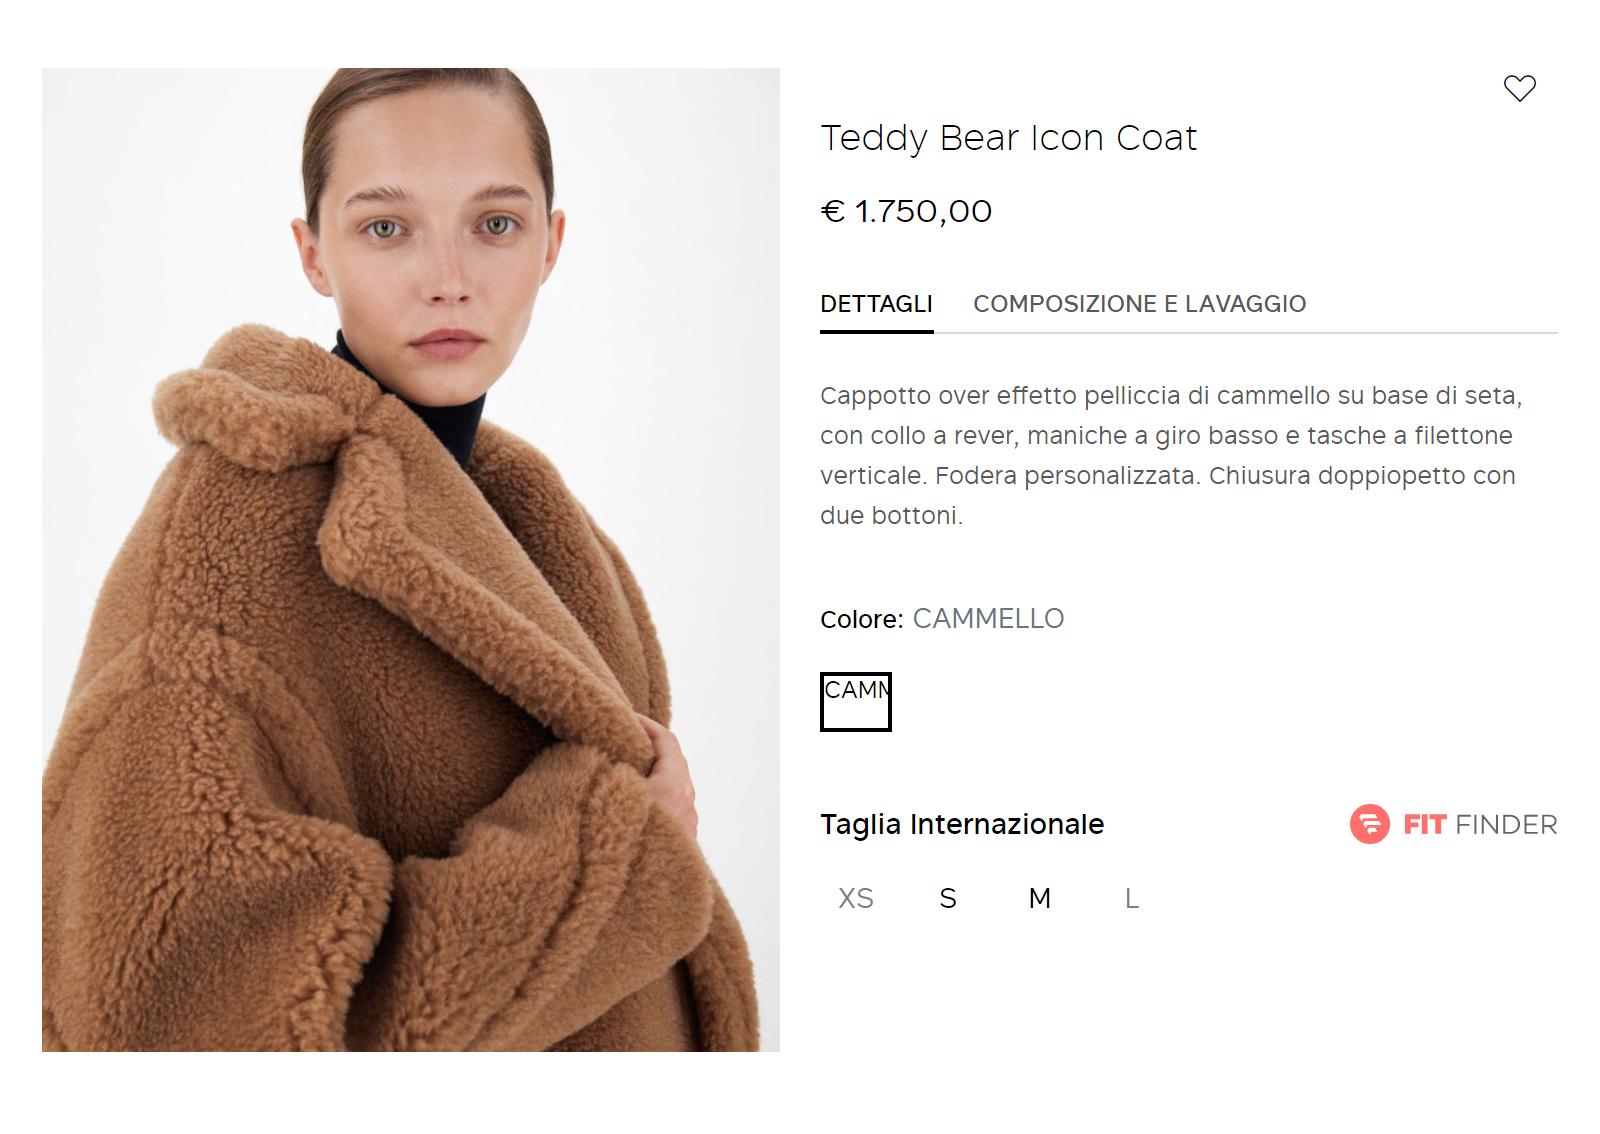 Такая&nbsp;же шуба на итальянском сайте Max Mara стоит 1750€ (159 741<span class=ruble>Р</span>). Источник: it.maxmara.com